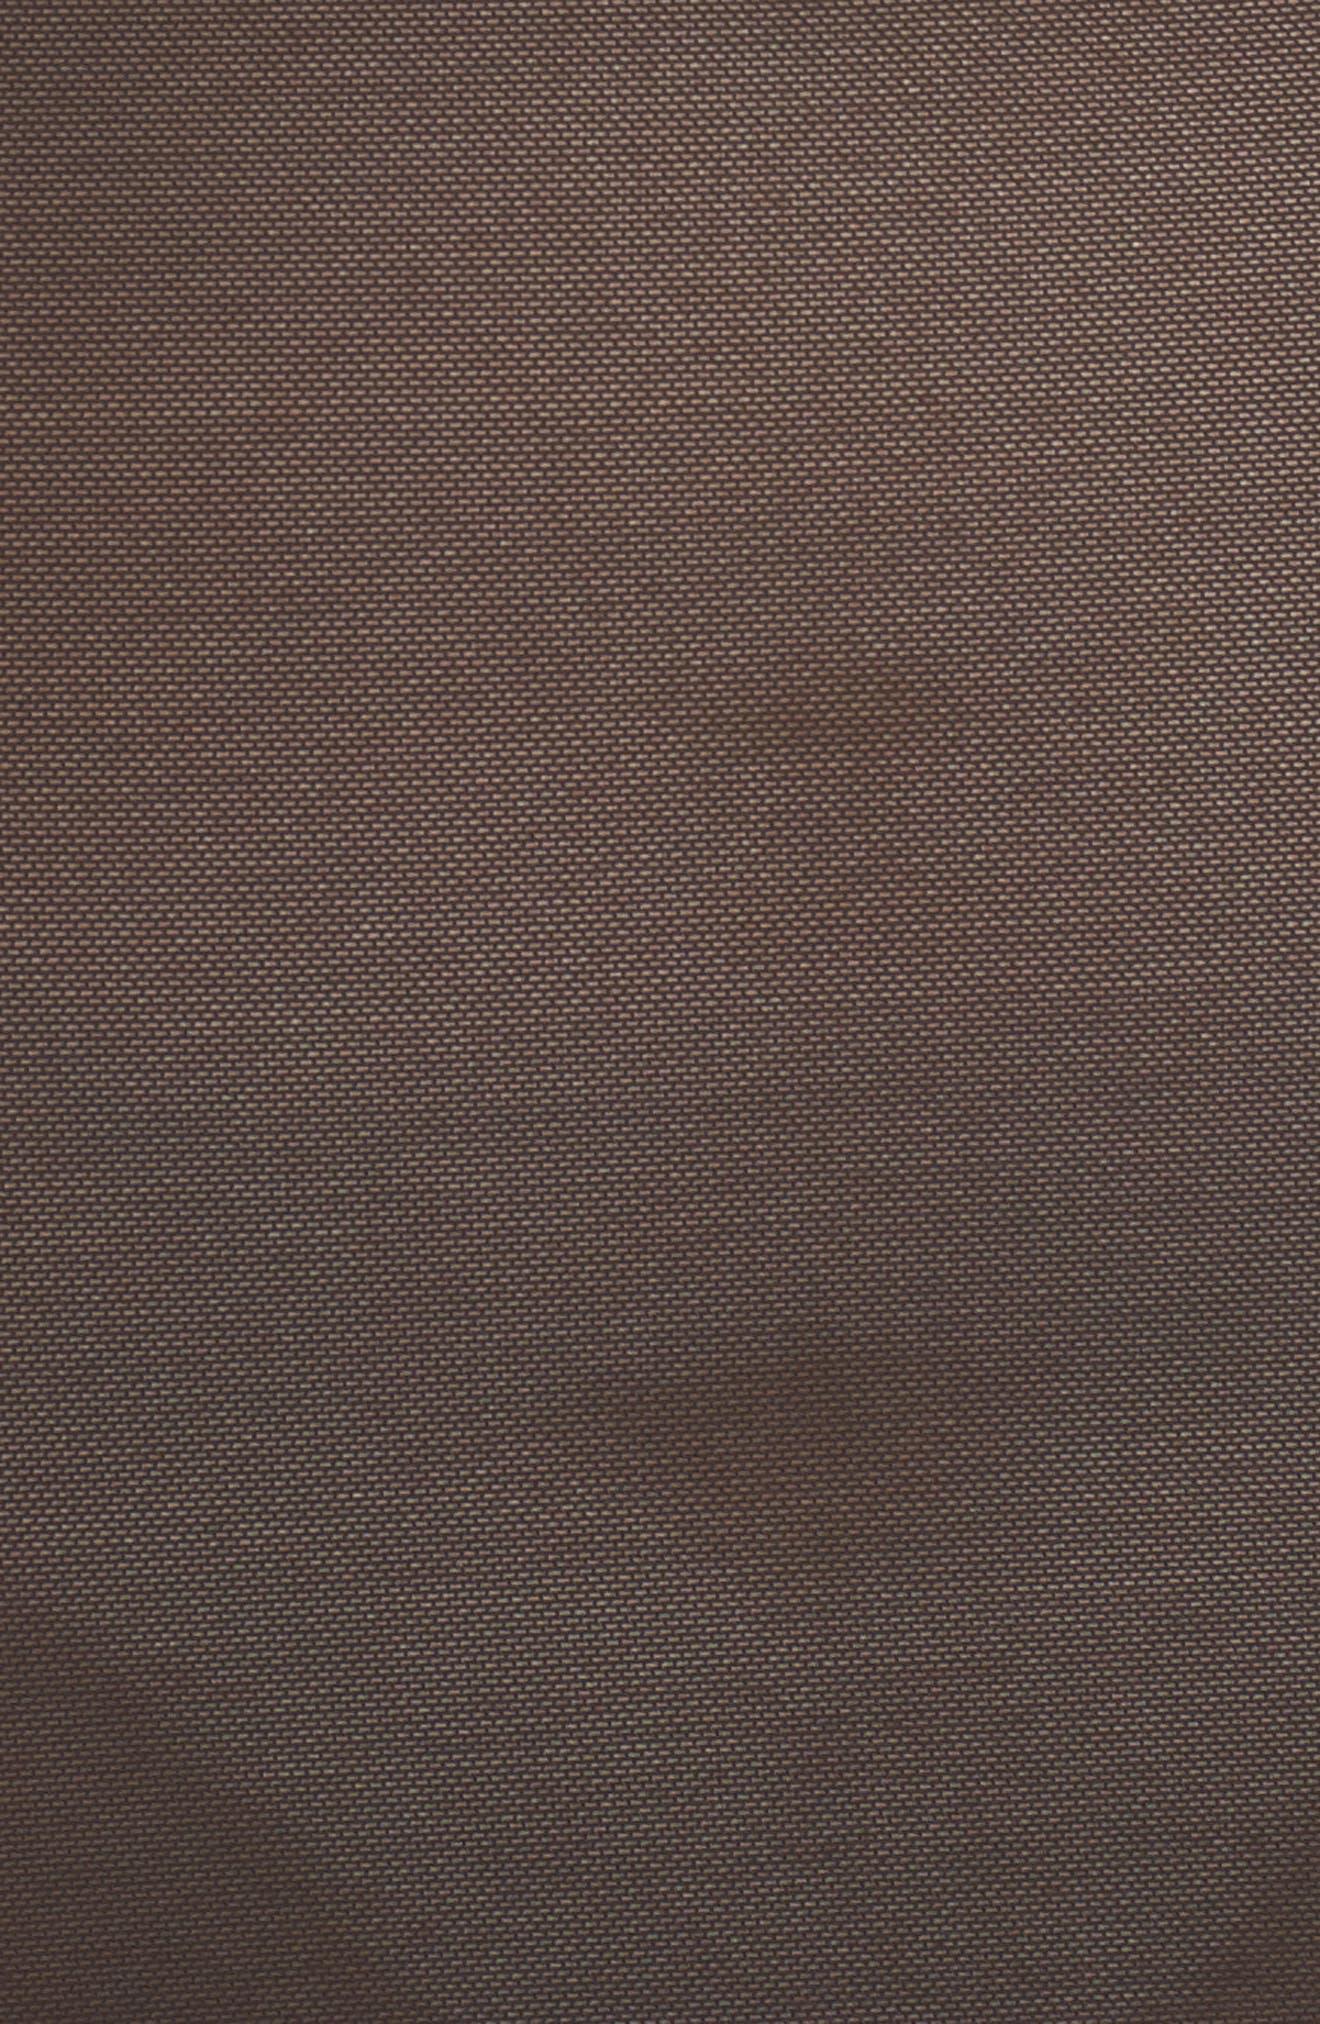 Seductive Silhouette Convertible Strapless Slip,                             Alternate thumbnail 6, color,                             BLACK